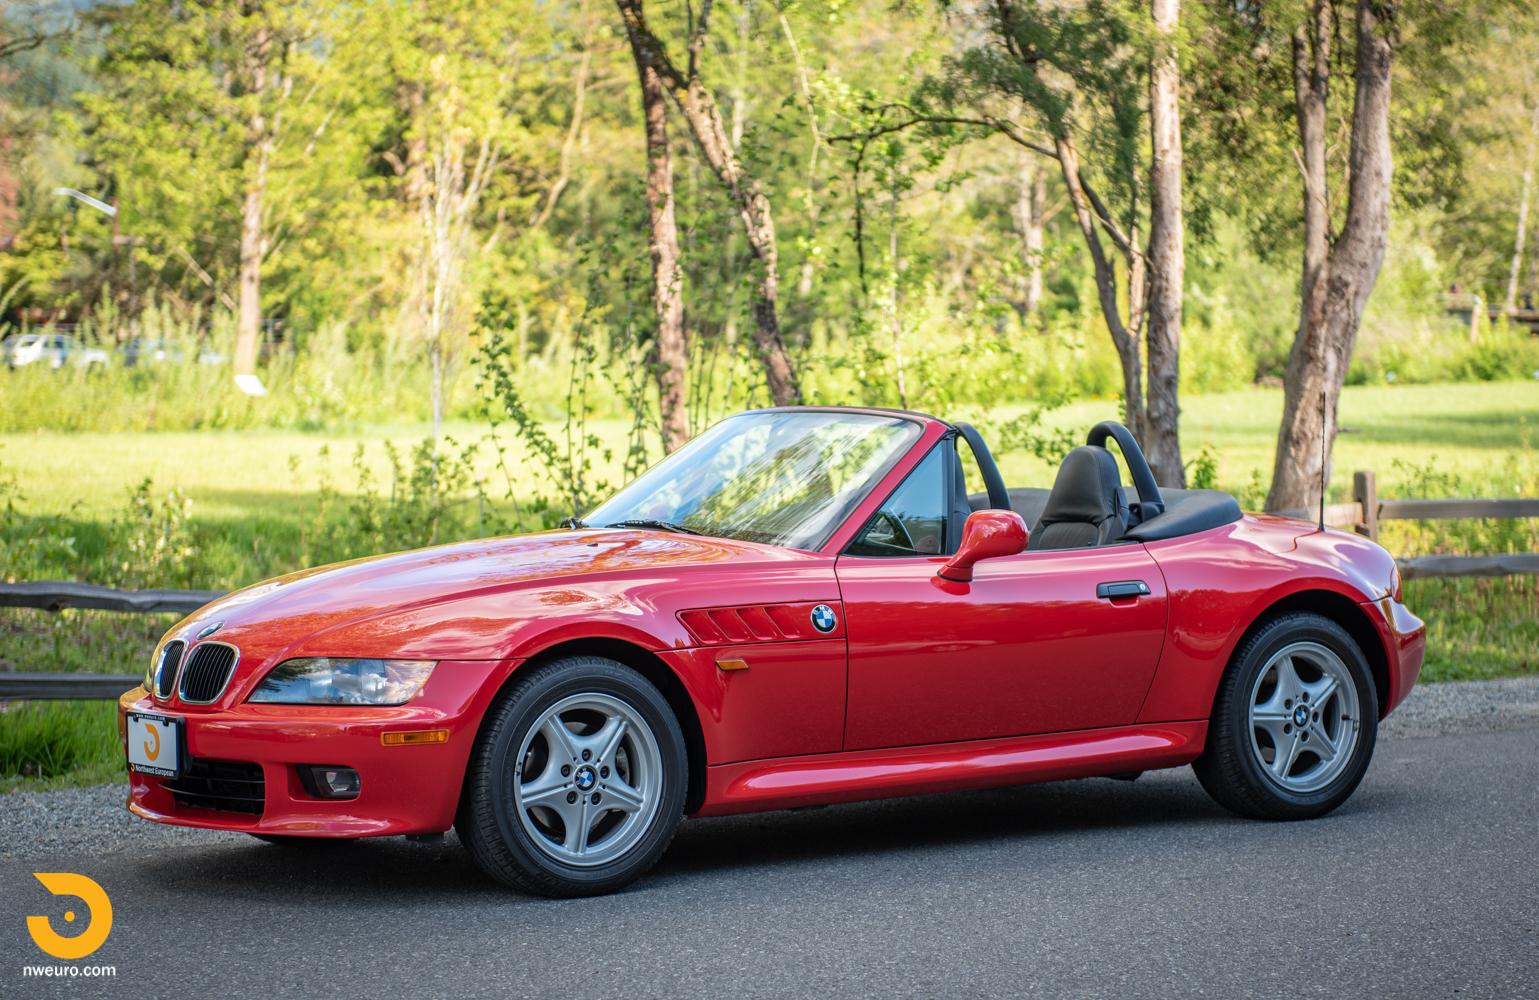 1999 BMW Z3 Roadster-85.jpg